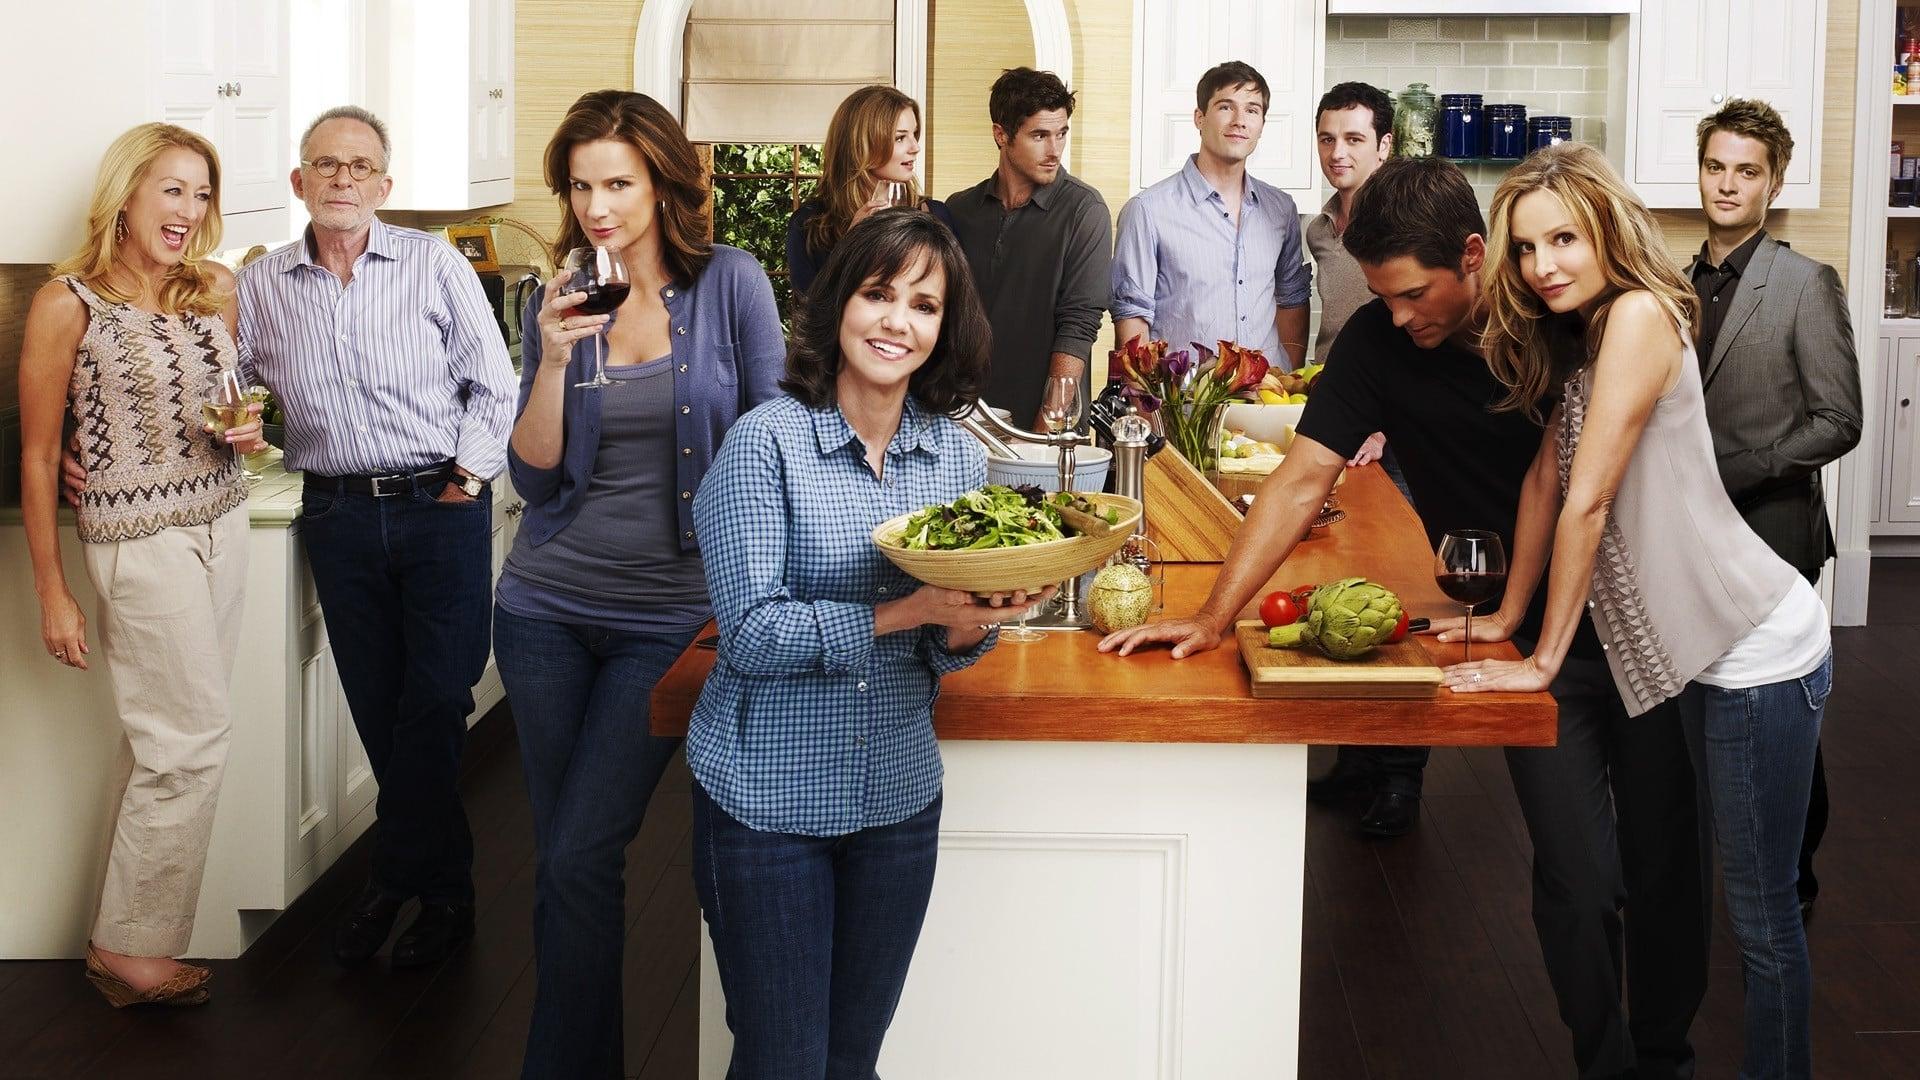 ABC cancelt 5 series waaronder Brothers & Sisters en V (2009)